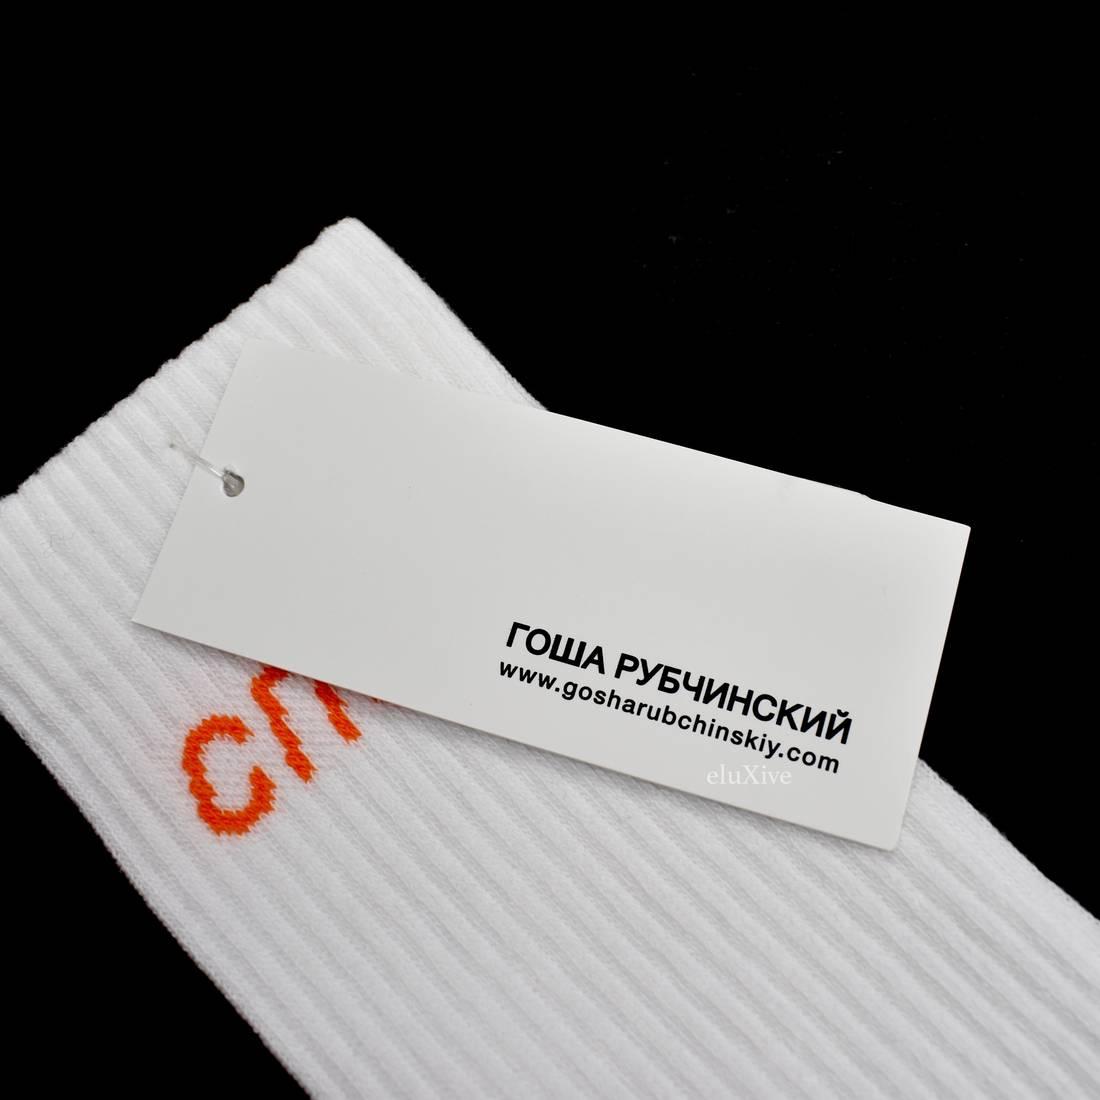 Gosha rubchinskiy white russian sport logo socks nwt size one size gosha rubchinskiy white russian sport logo socks nwt size one size 5 reheart Images